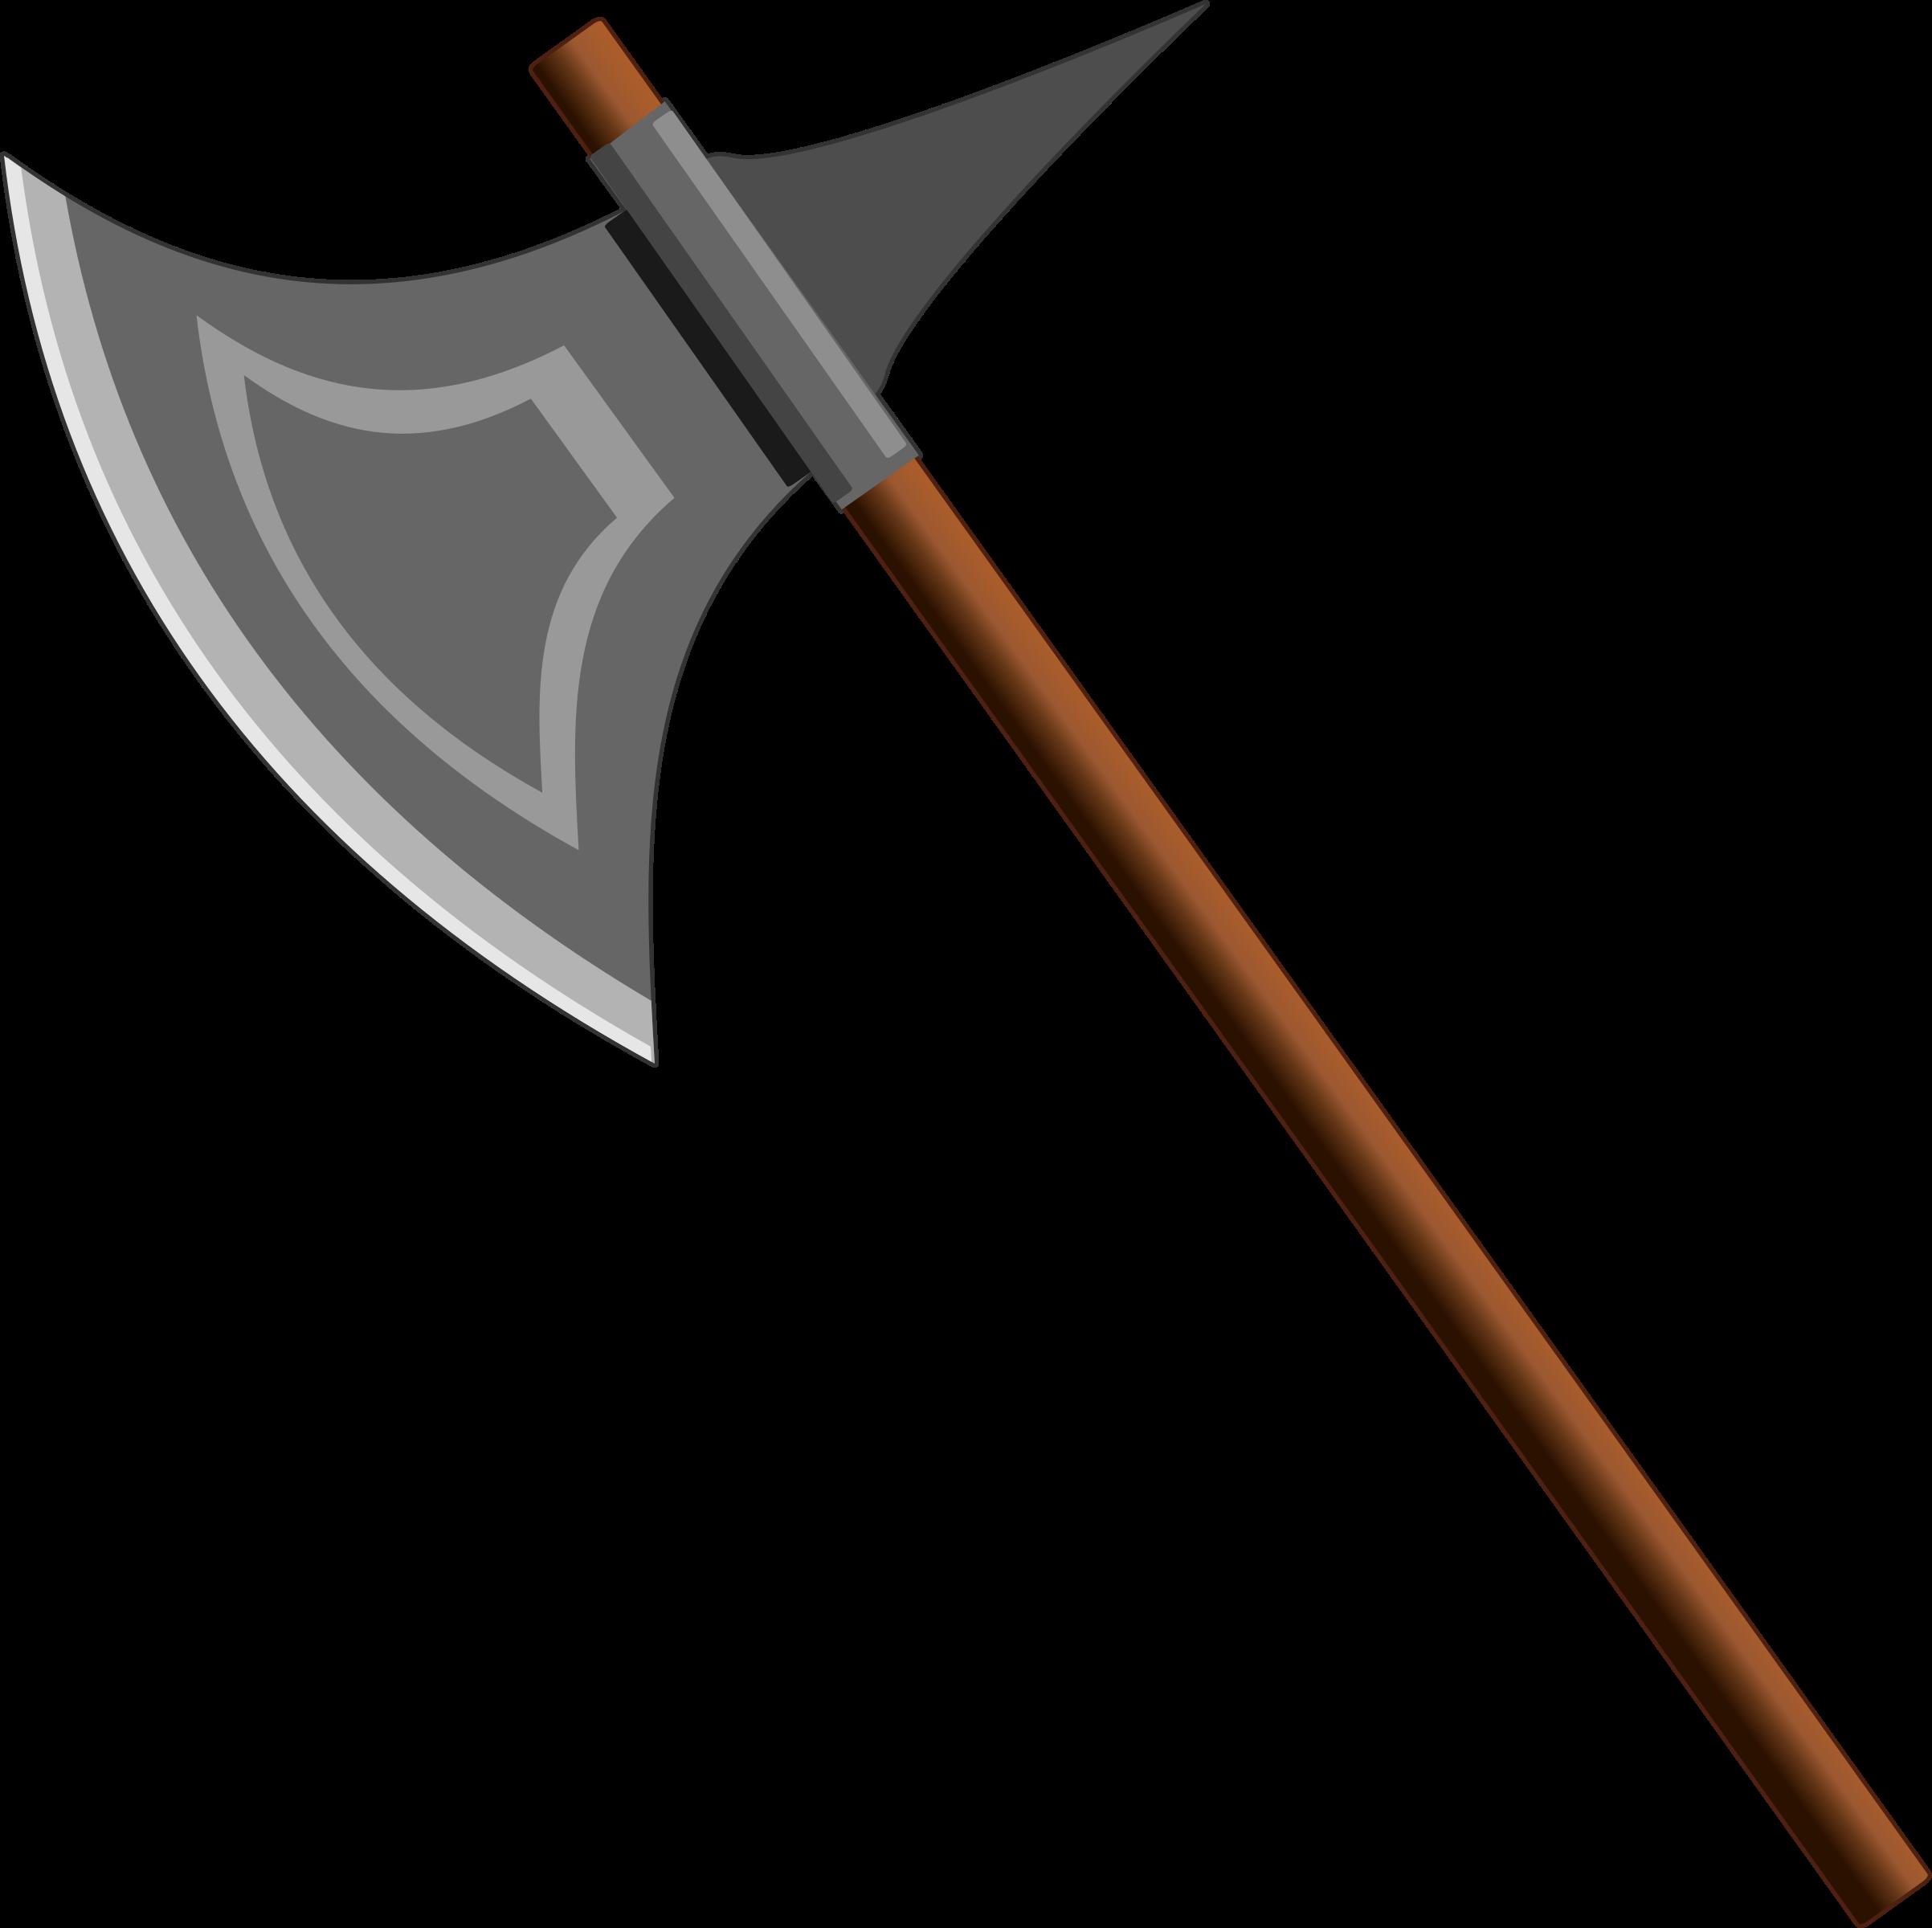 Axe. Lumberjack clipart hatchet